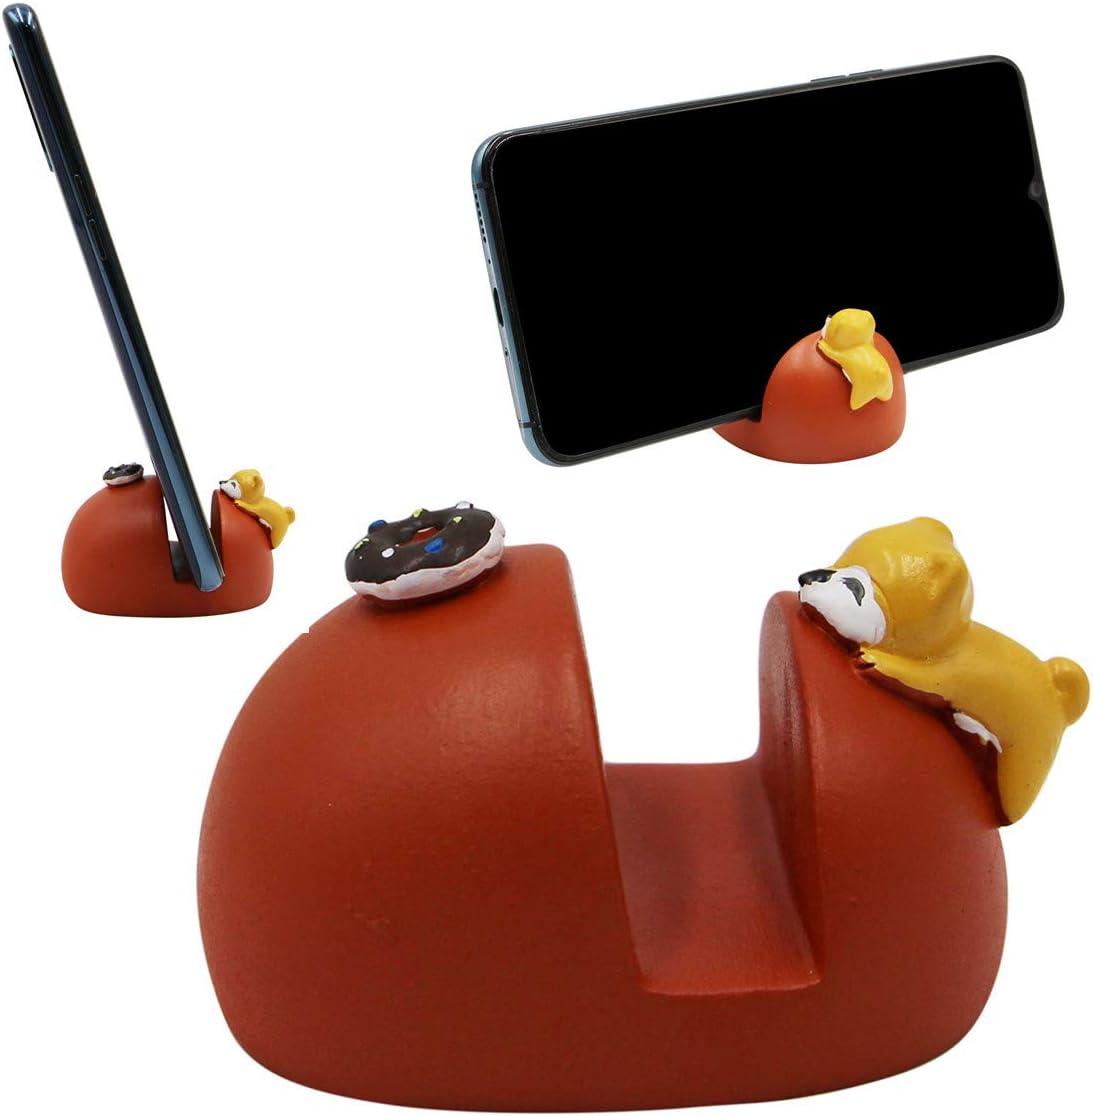 Cute Lovely Cartoon Resin Cell Phone Stand Holder Desktop Tablet Office Decor Home Ornament